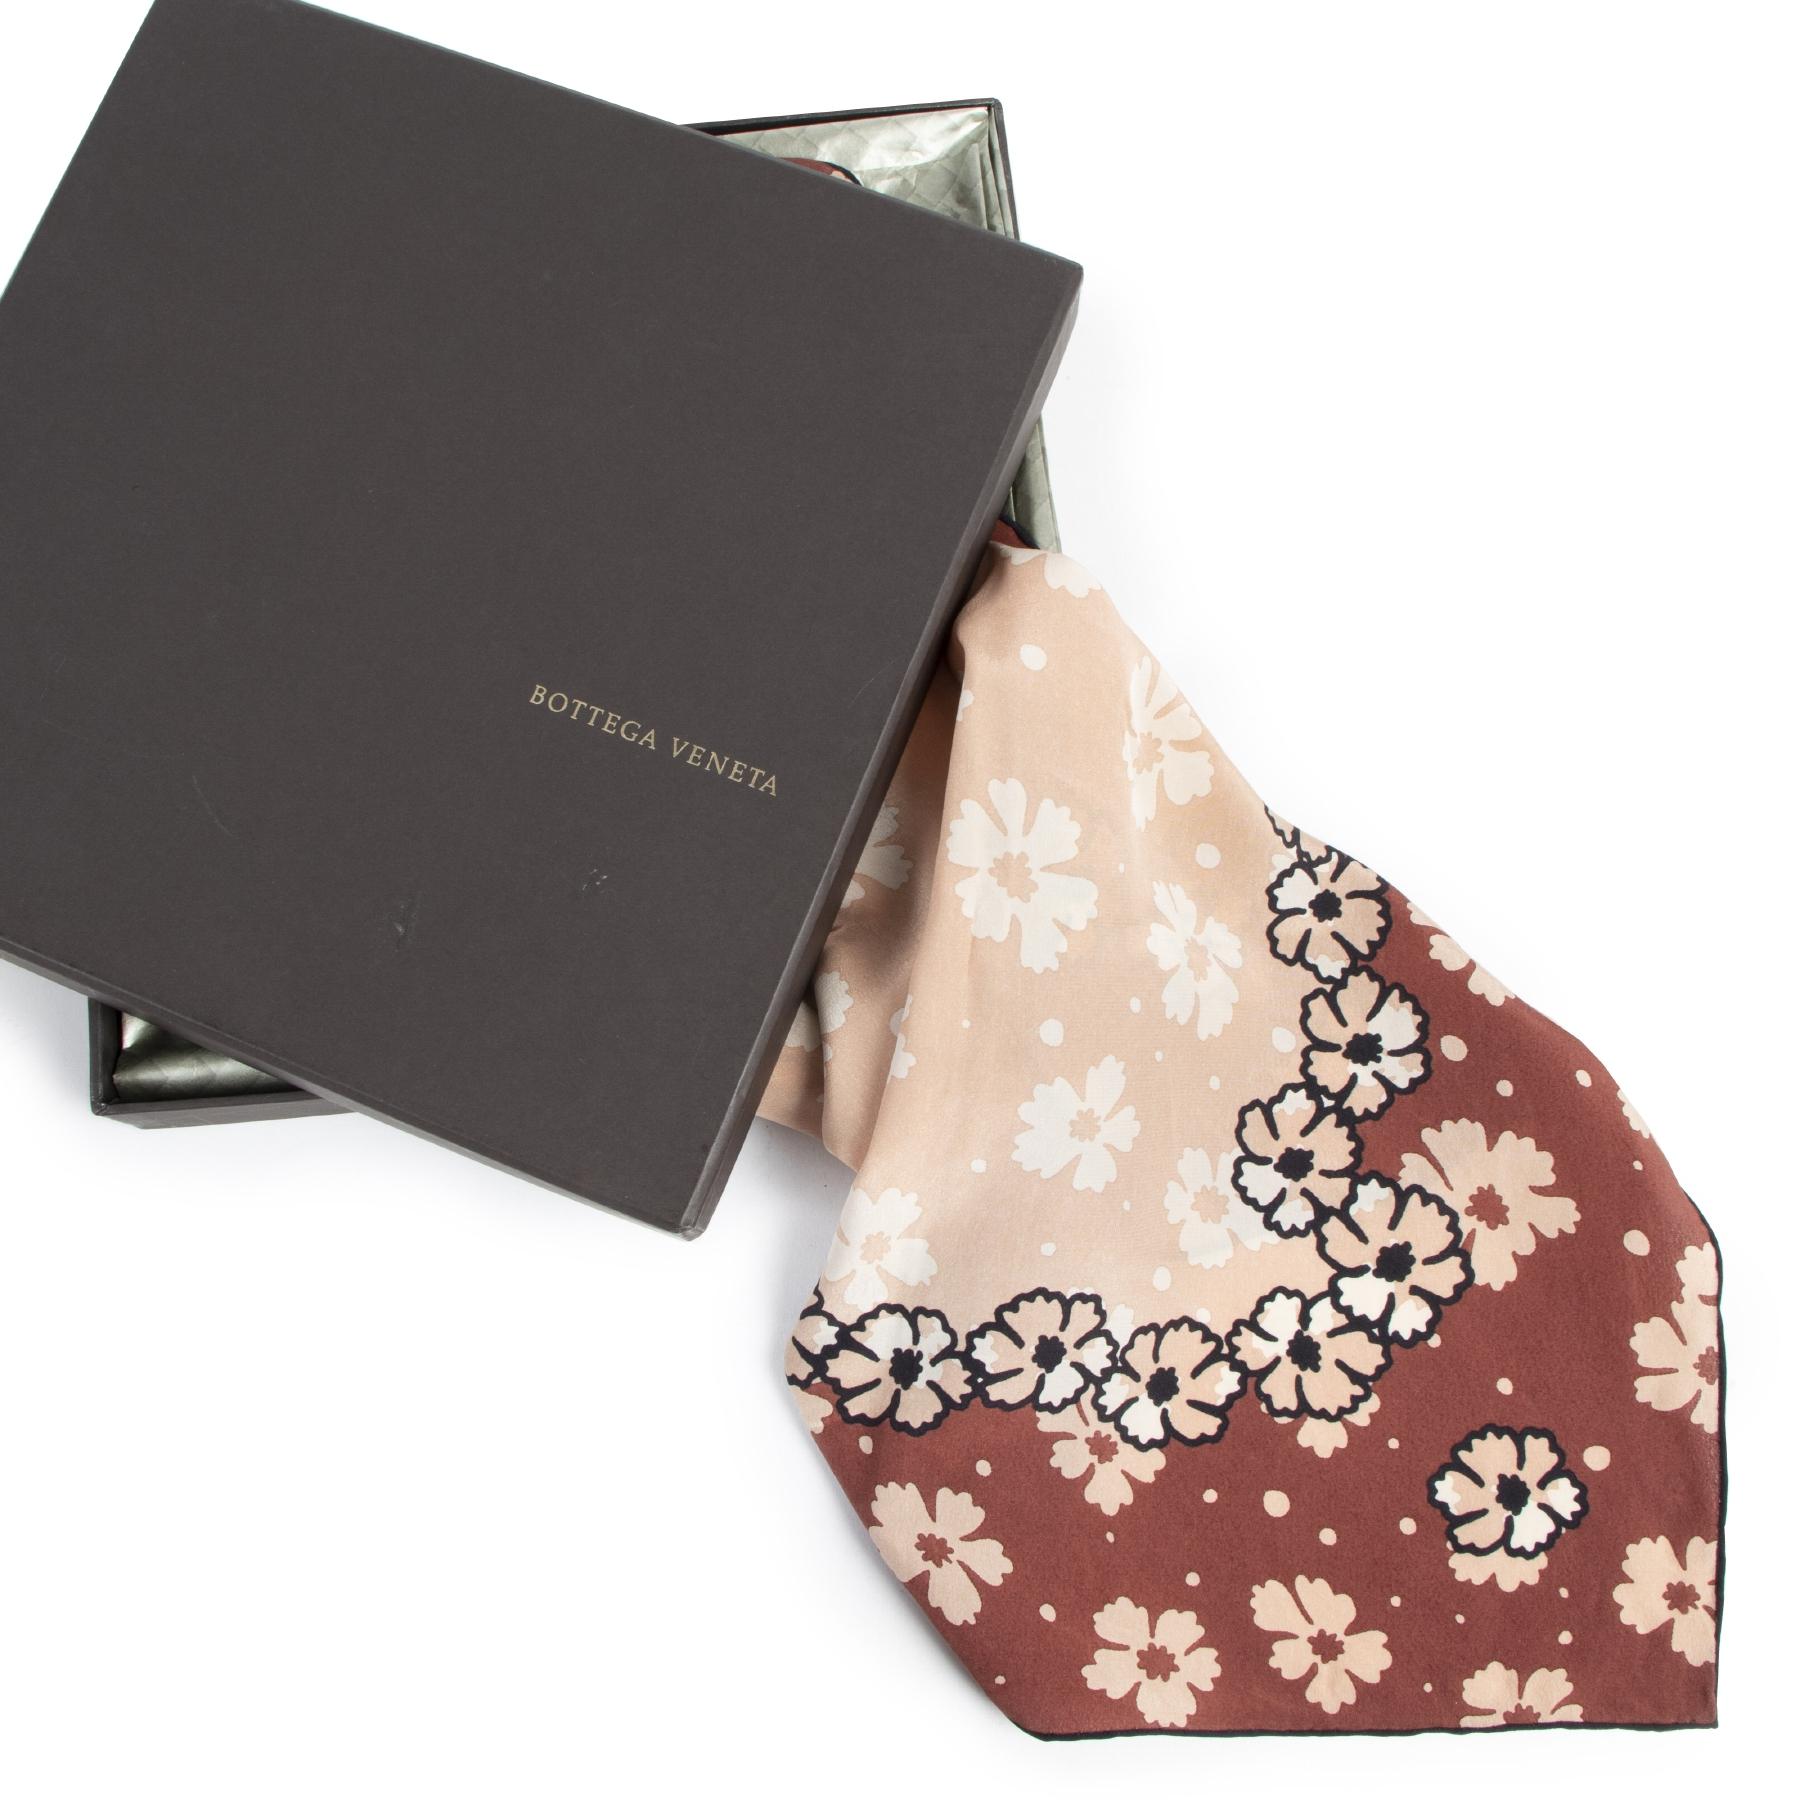 Authentic secondhand Bottega Veneta Floral Print Silk Scarf designer accessories fashion luxury vintage webshop safe secure online shopping high end designer brands